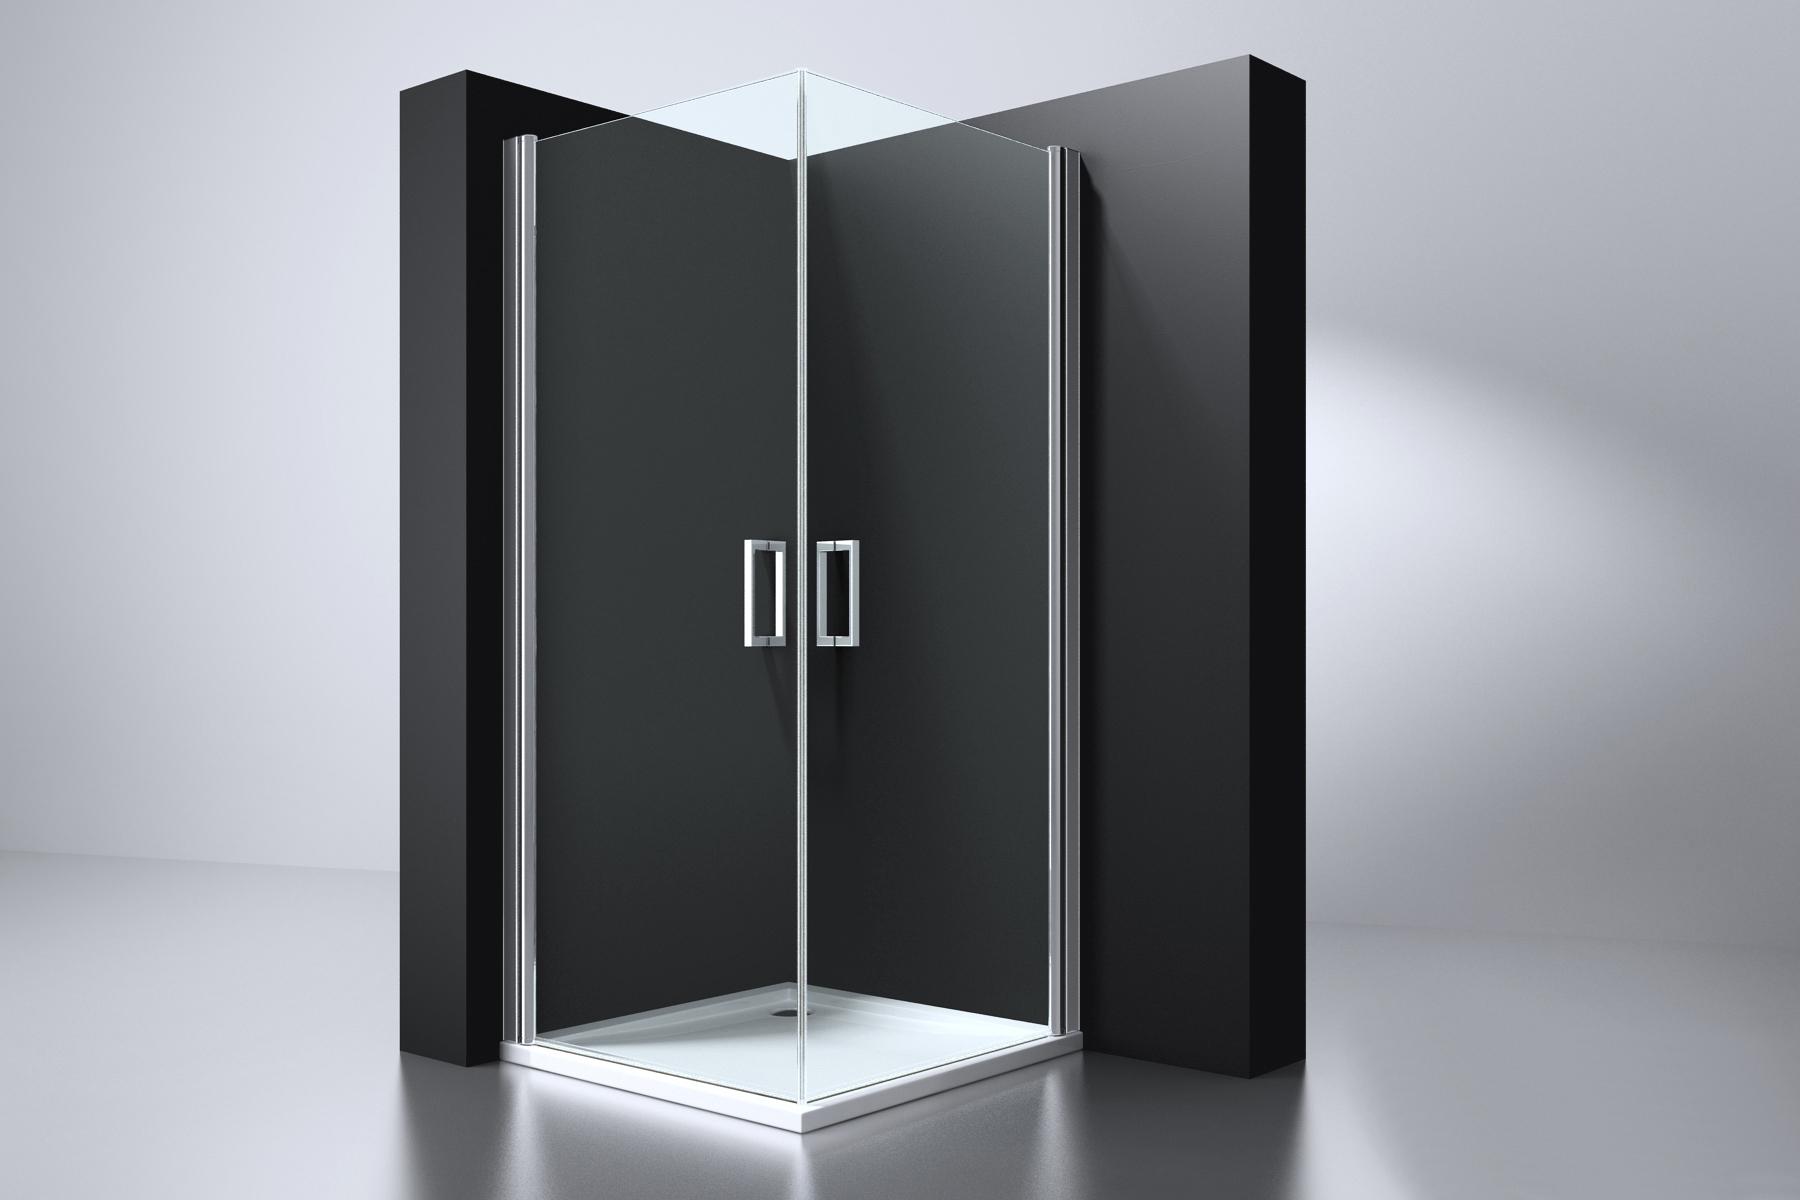 Best Design Arek vierkante cabine m.2 deuren 100x100cm ANTI-KALK